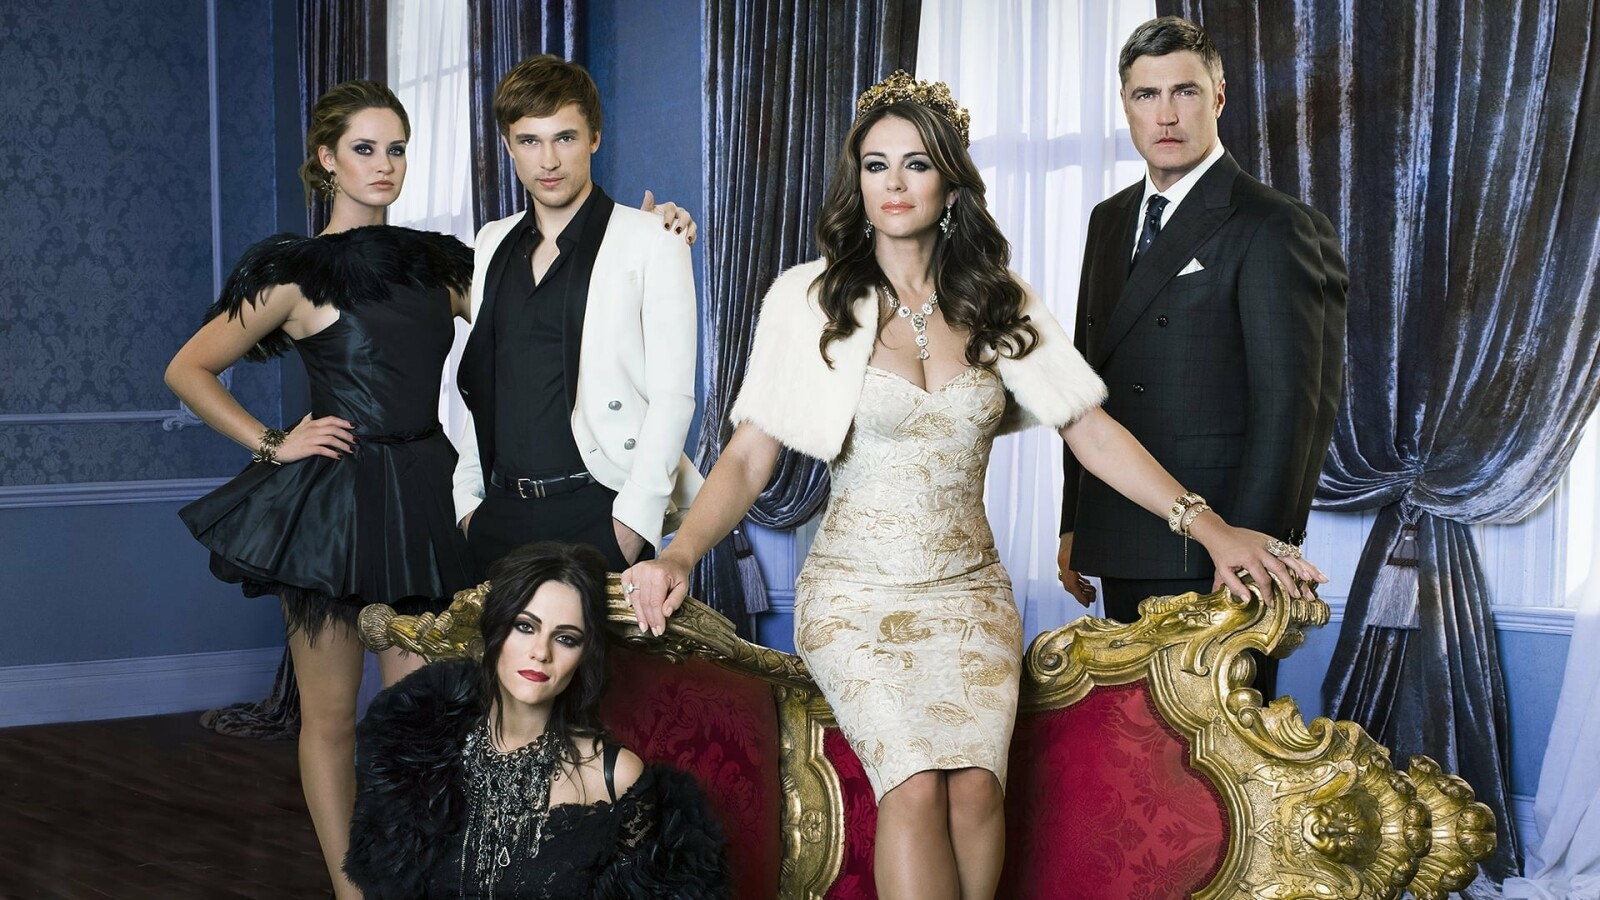 The Royals Sendetermine